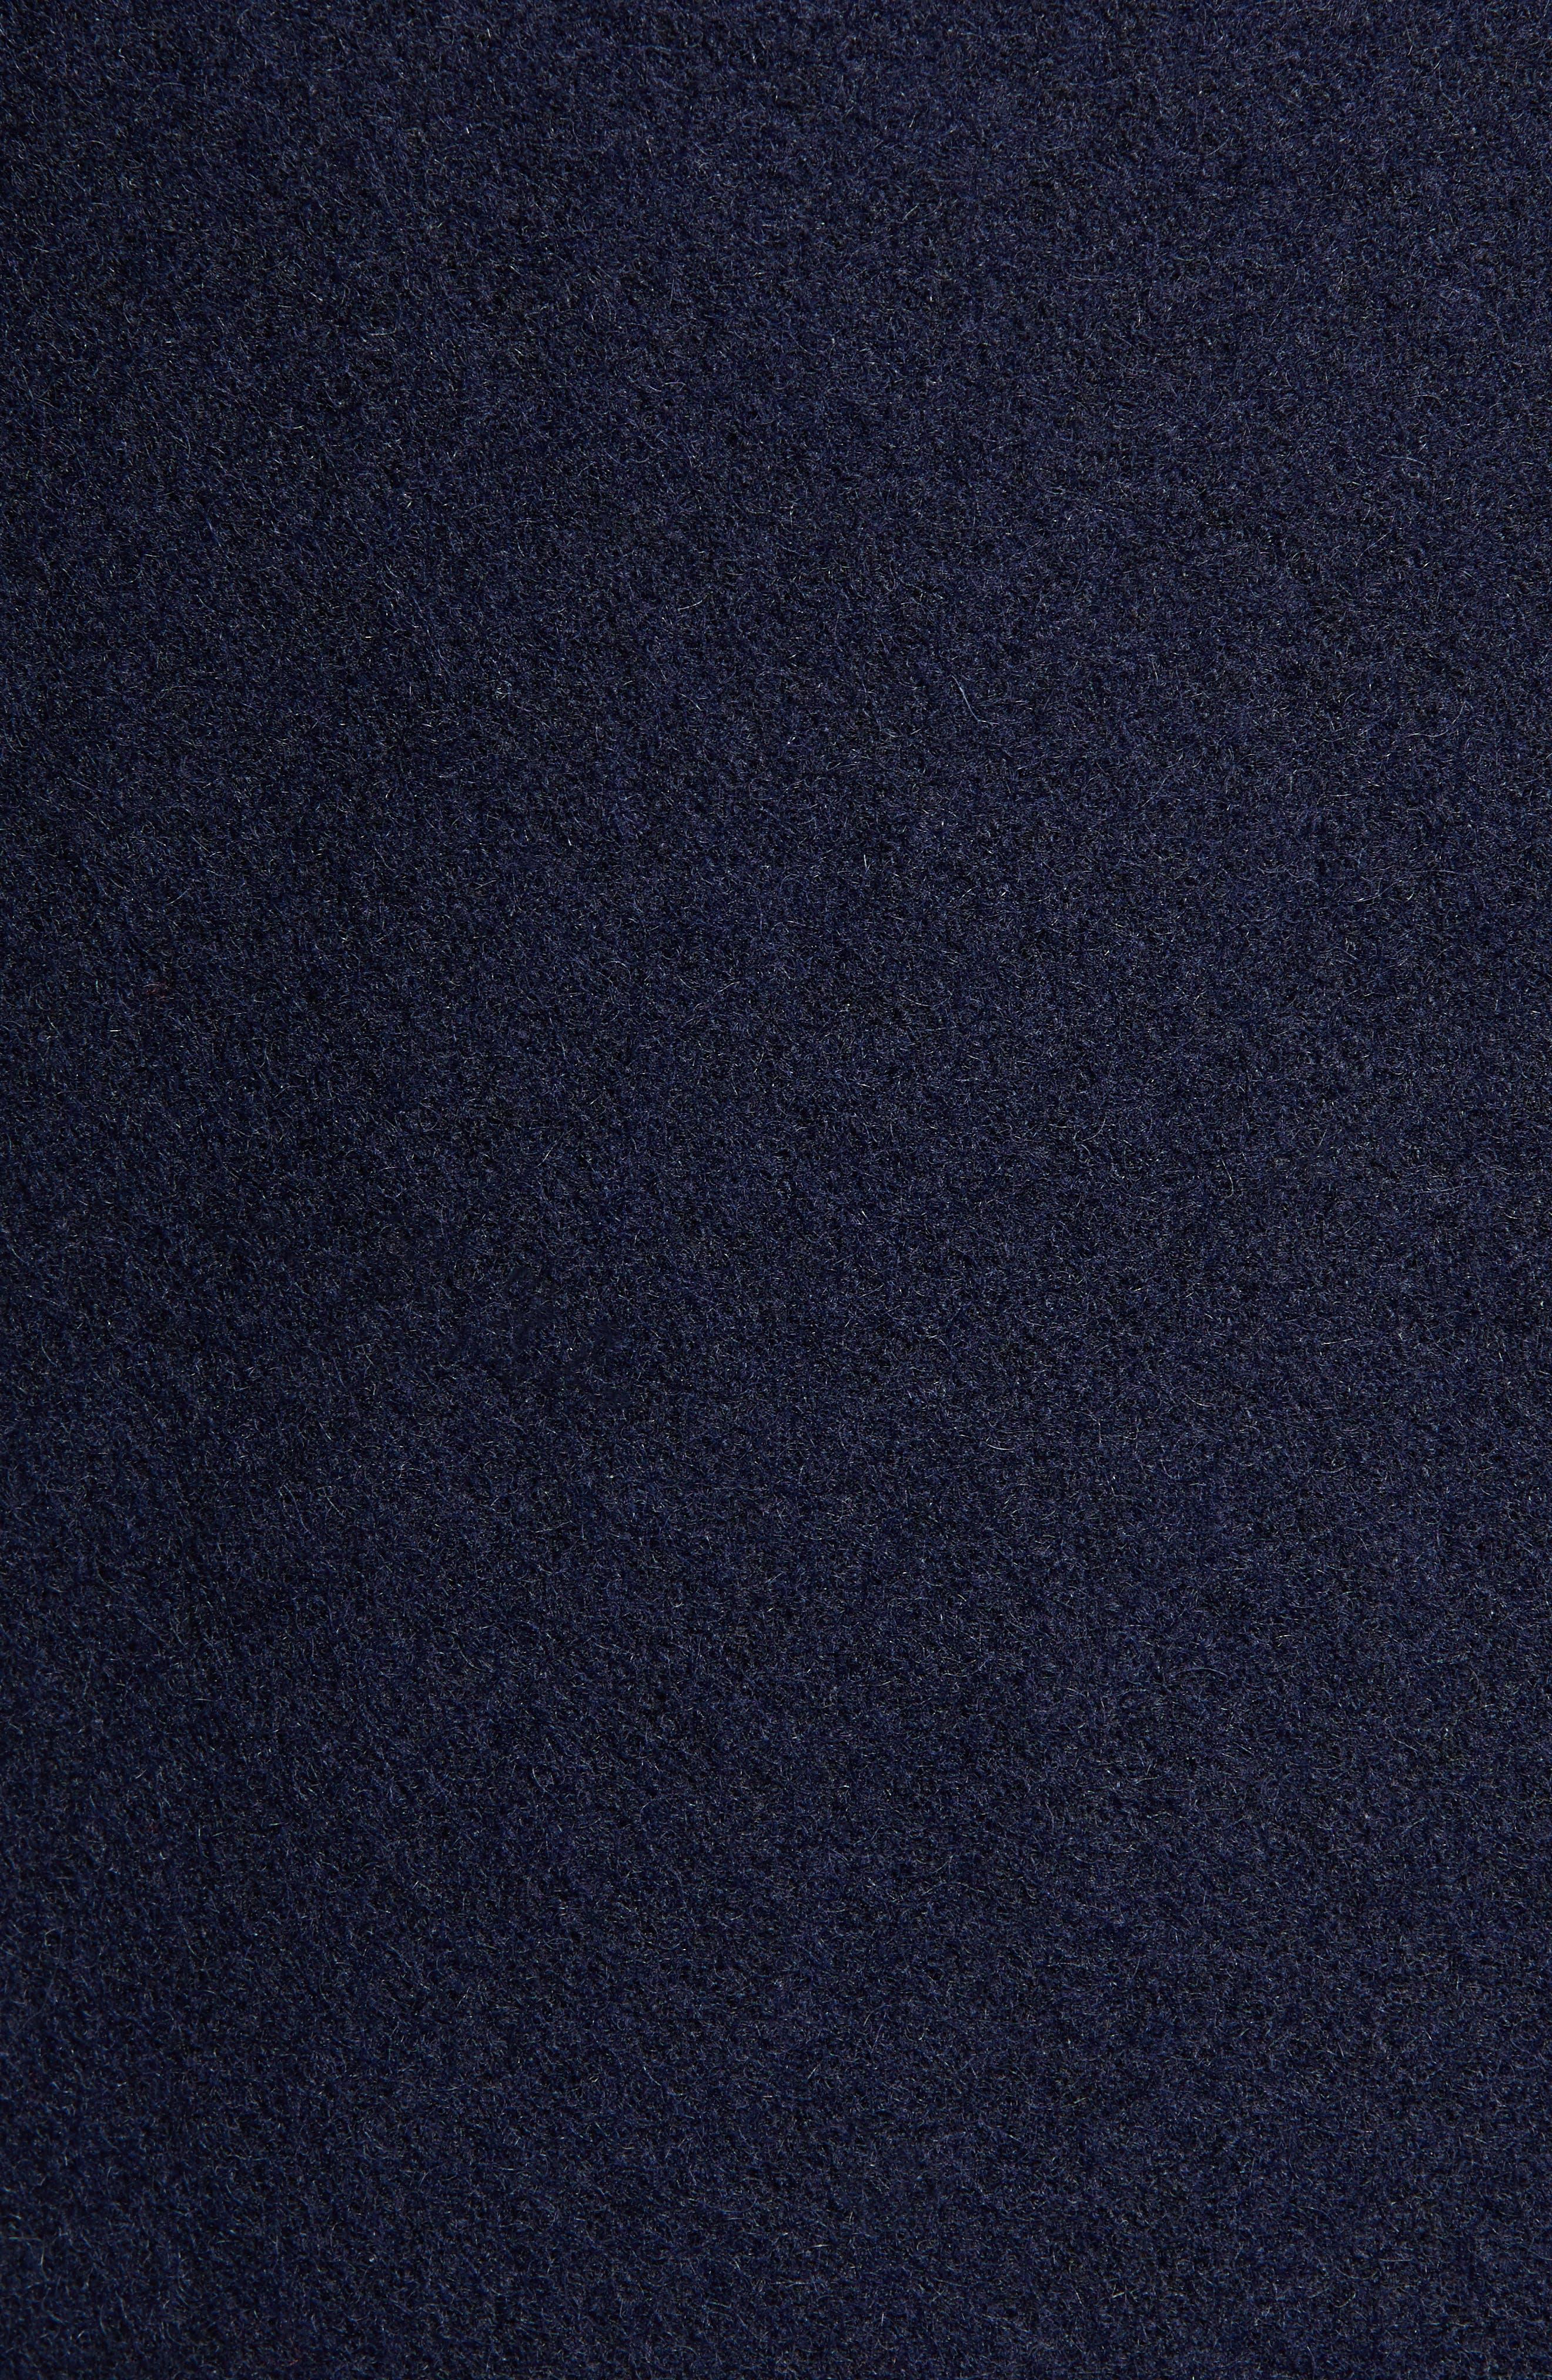 Slim Fit Wool Blend Peacoat,                             Alternate thumbnail 6, color,                             NAVY